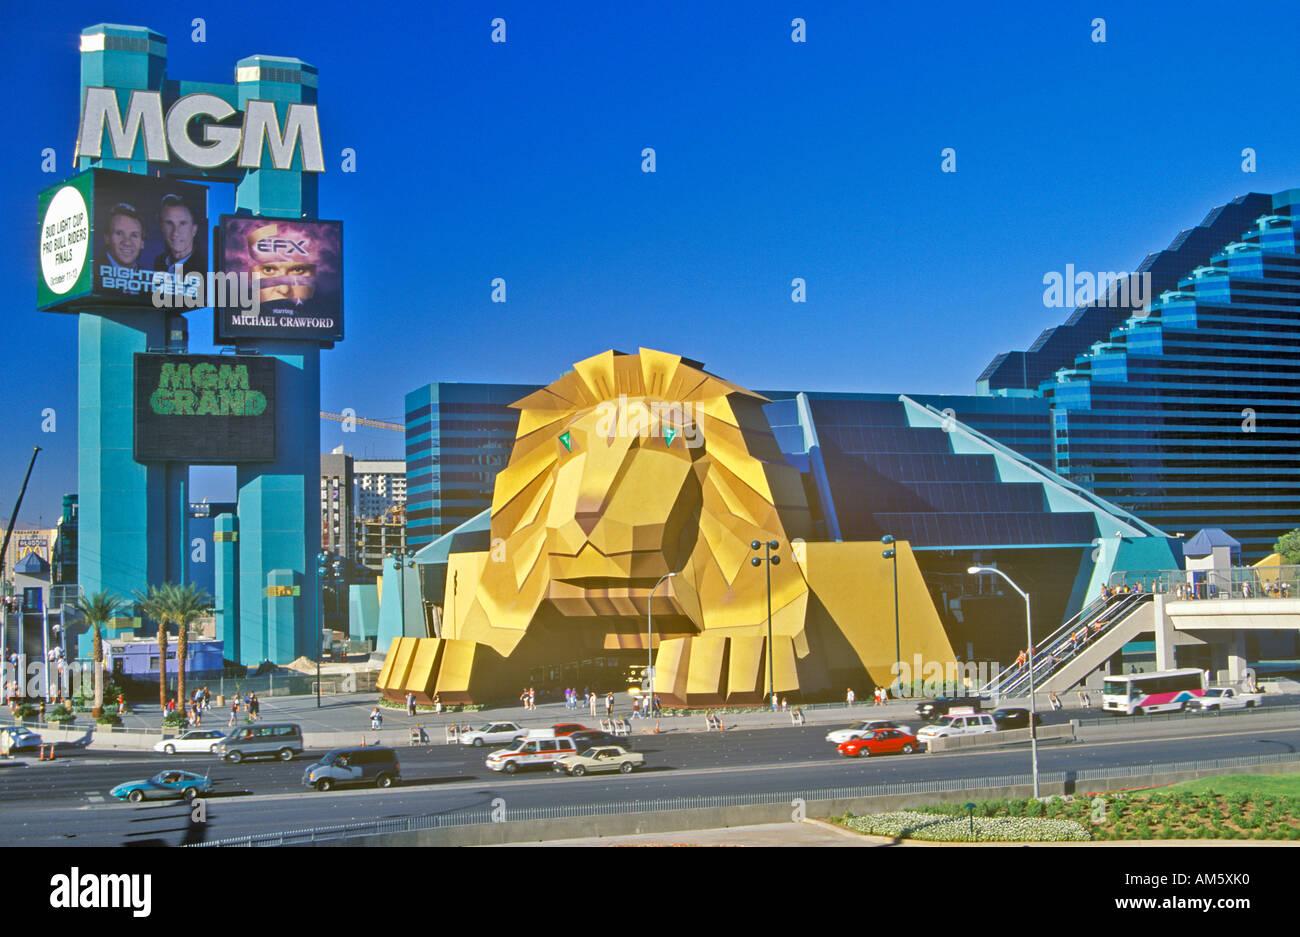 Replik Des Lowen Am Eingang Des Mgm Grand Hotel Las Vegas Nv Stockfotografie Alamy